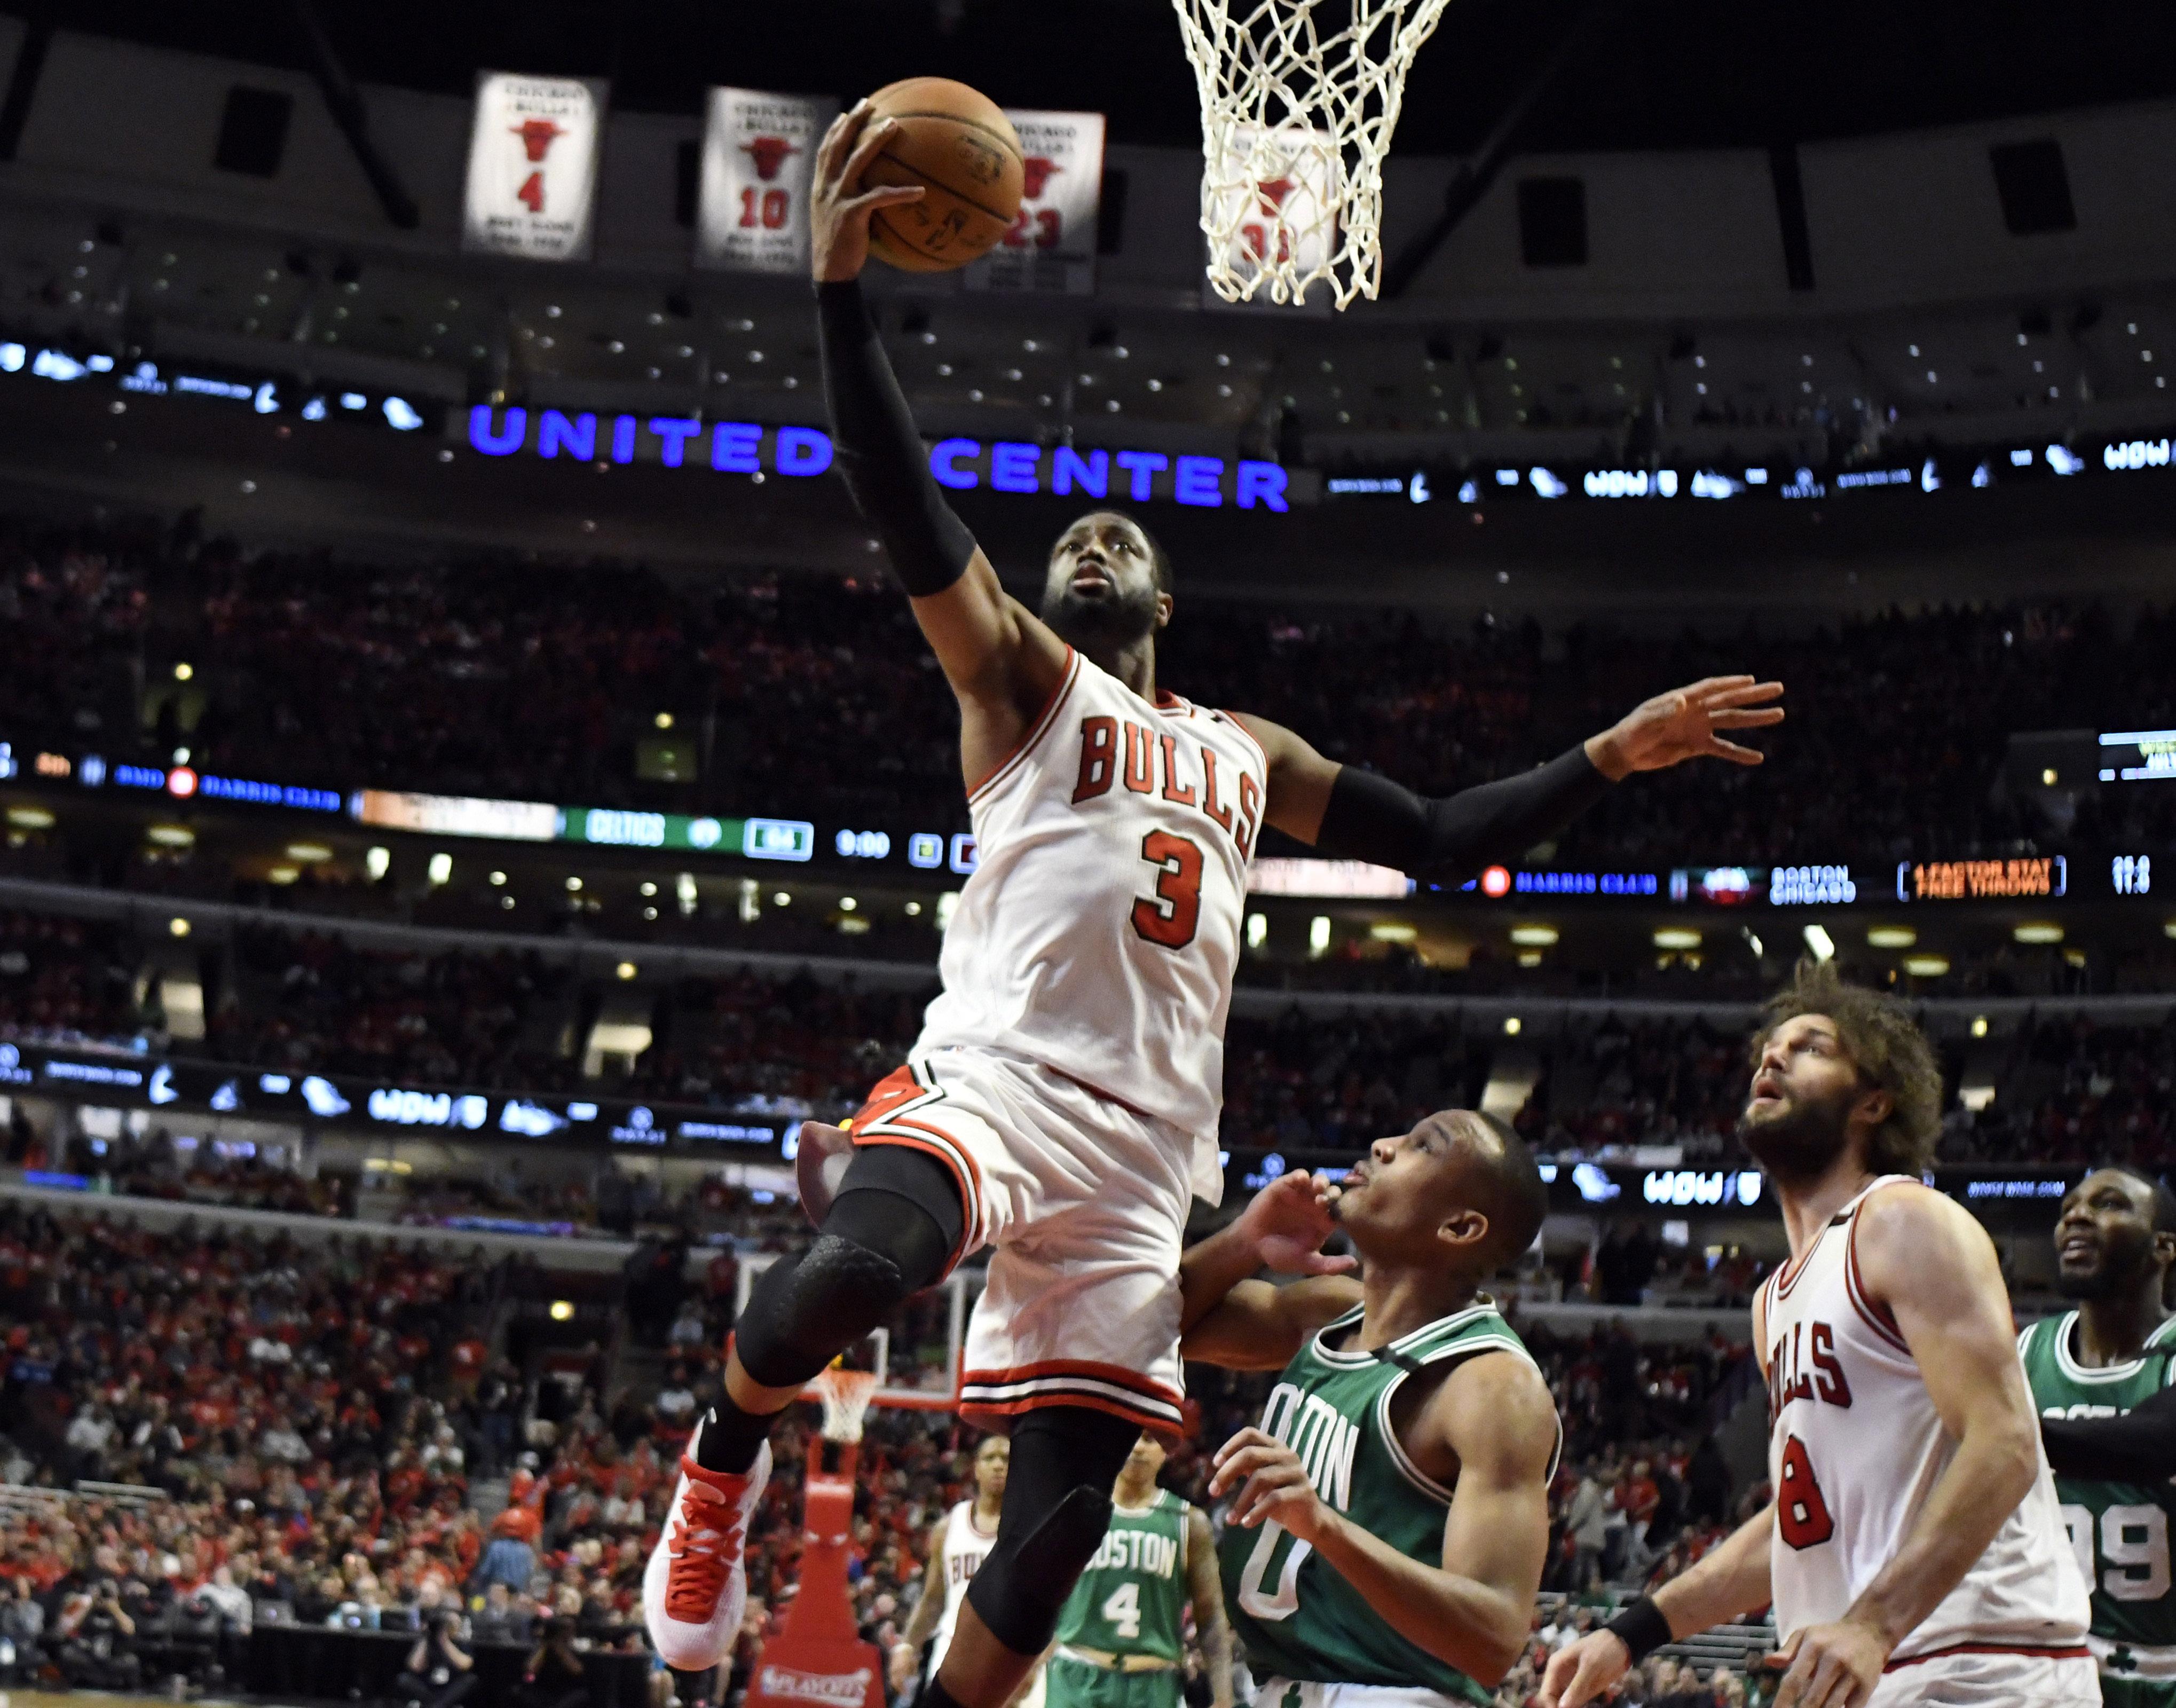 10035208-nba-playoffs-boston-celtics-at-chicago-bulls